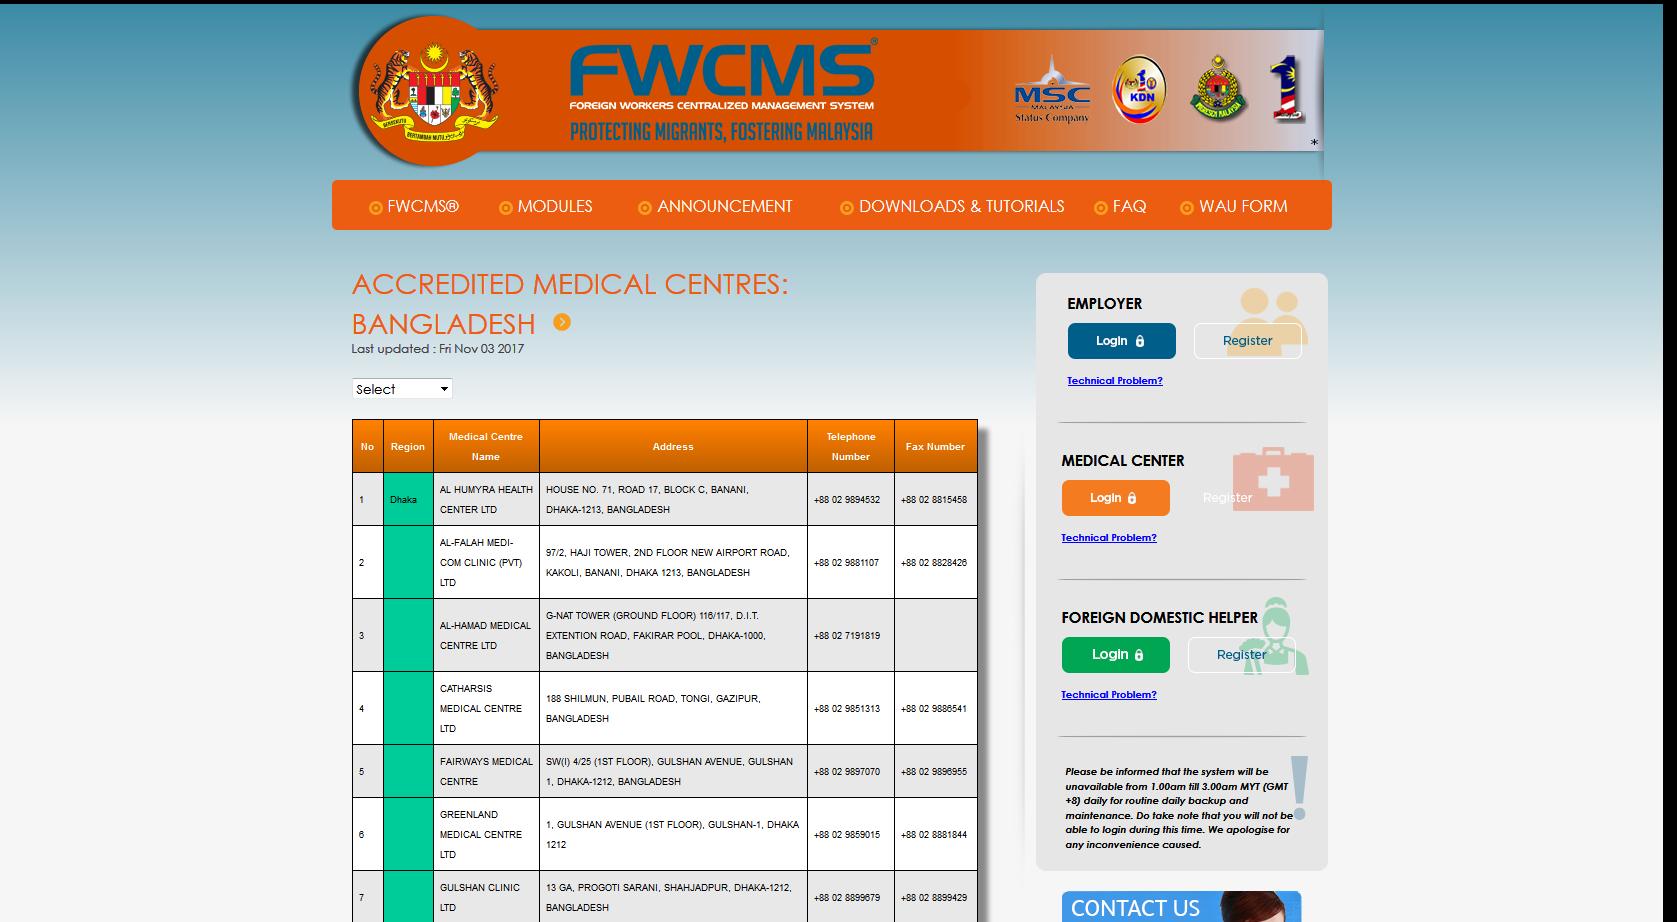 FWCMS - List